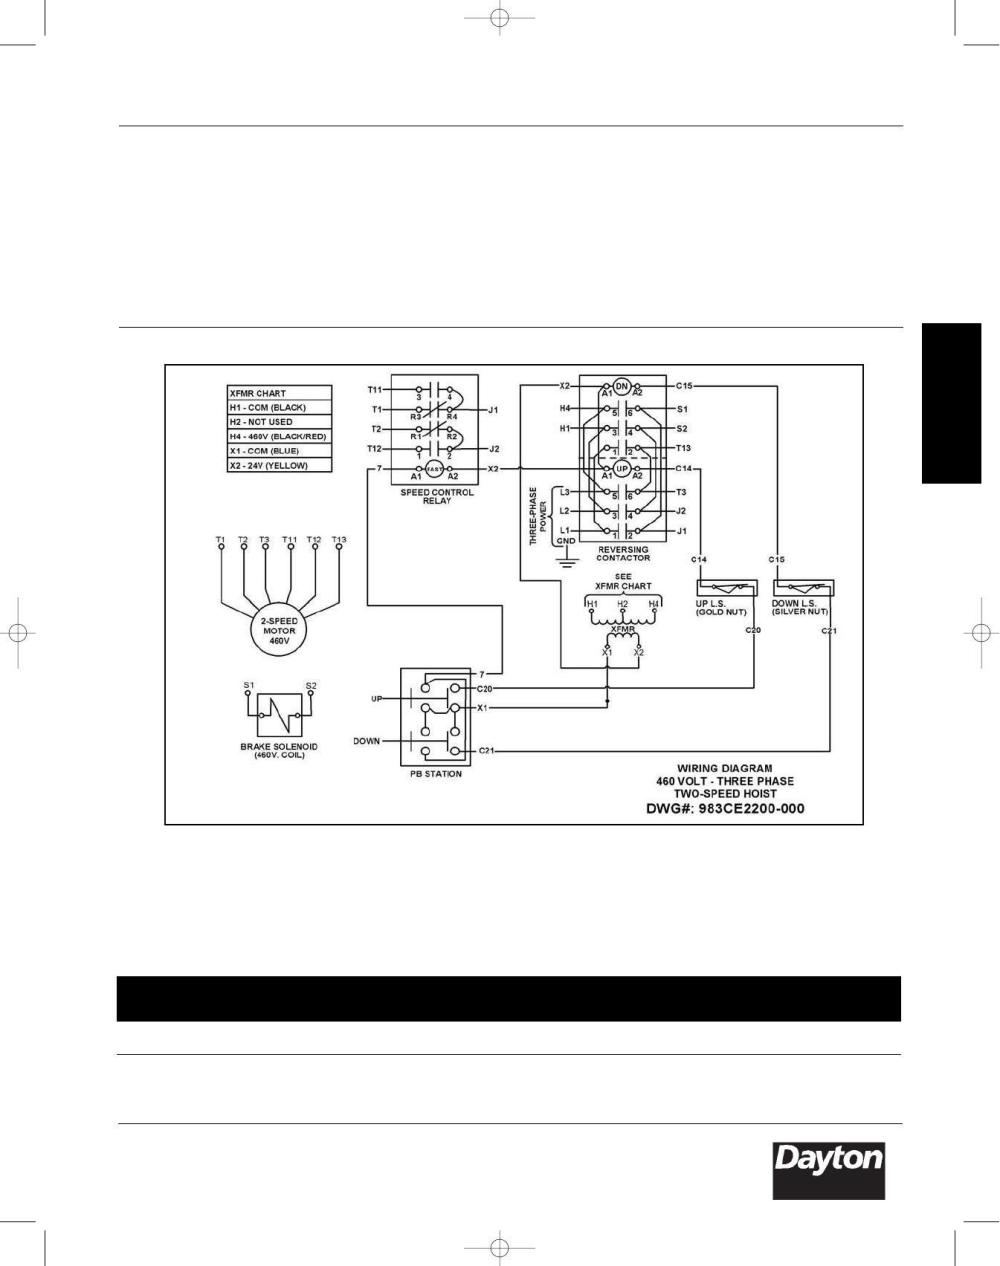 medium resolution of wiring model electric diagram motor 6k882c wiring diagrams simple wiring model electric diagram motor 6k882c